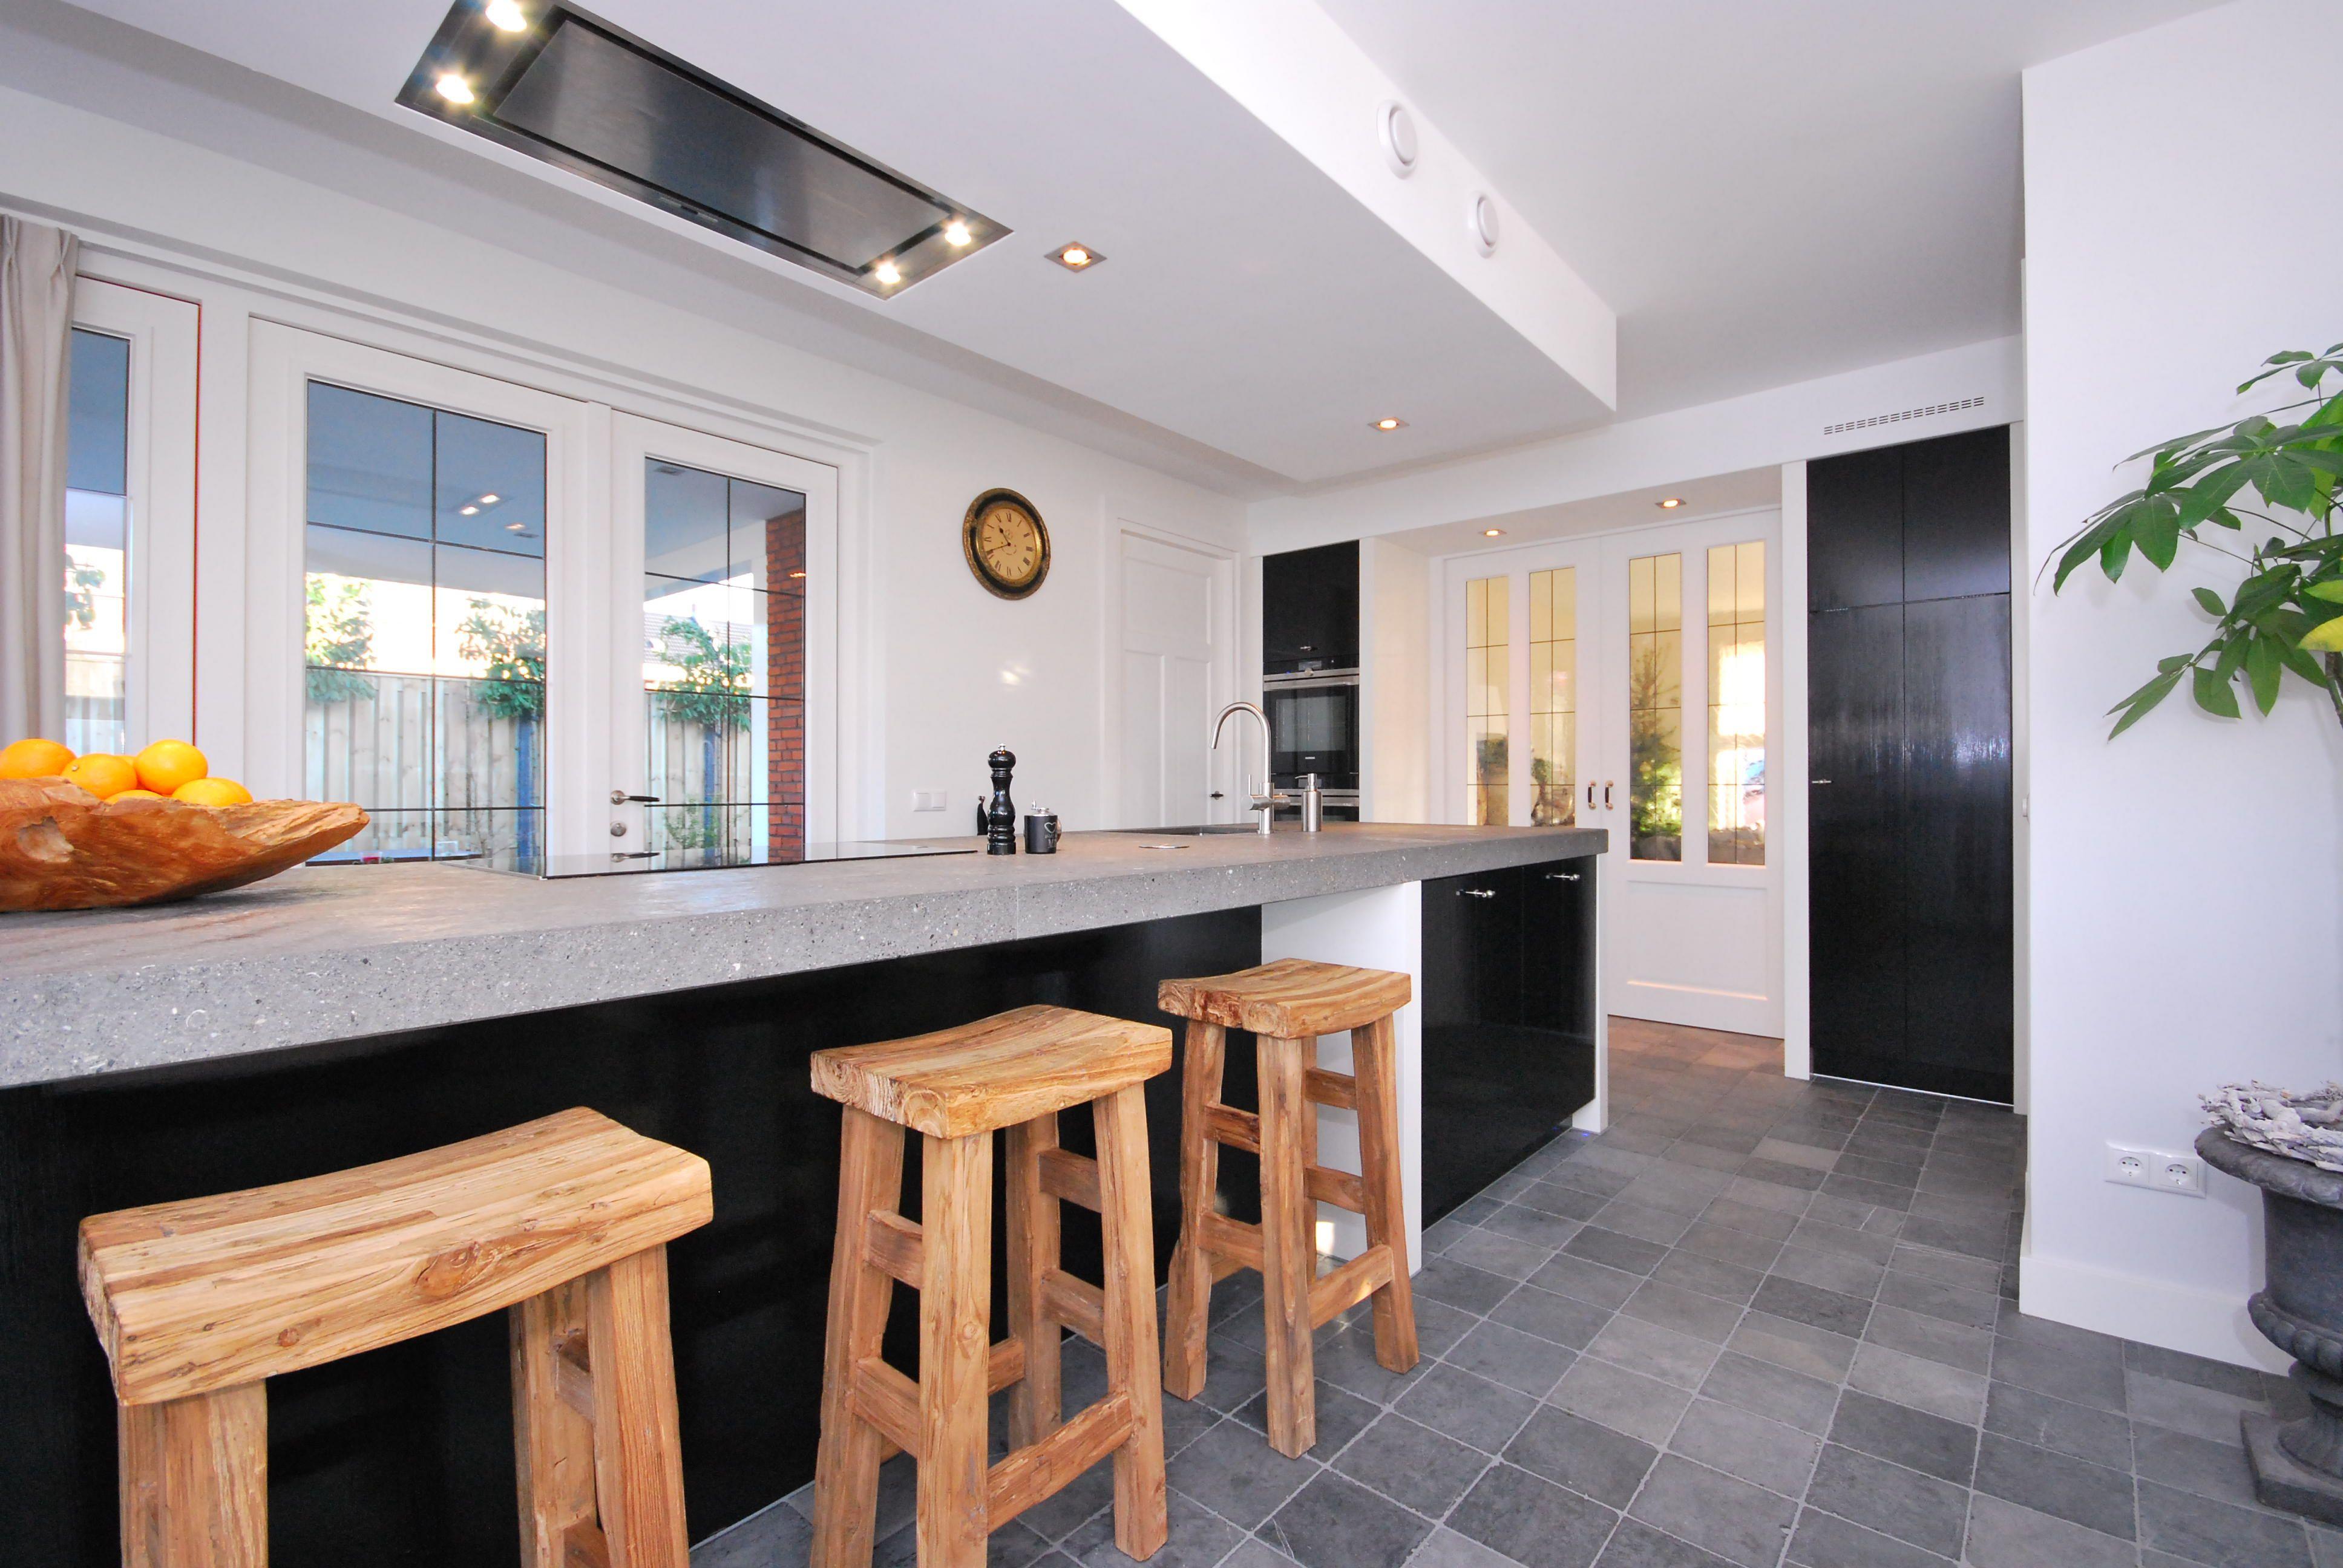 Vloer icm zwarte keuken natuurstenen werkblad paëllastone l